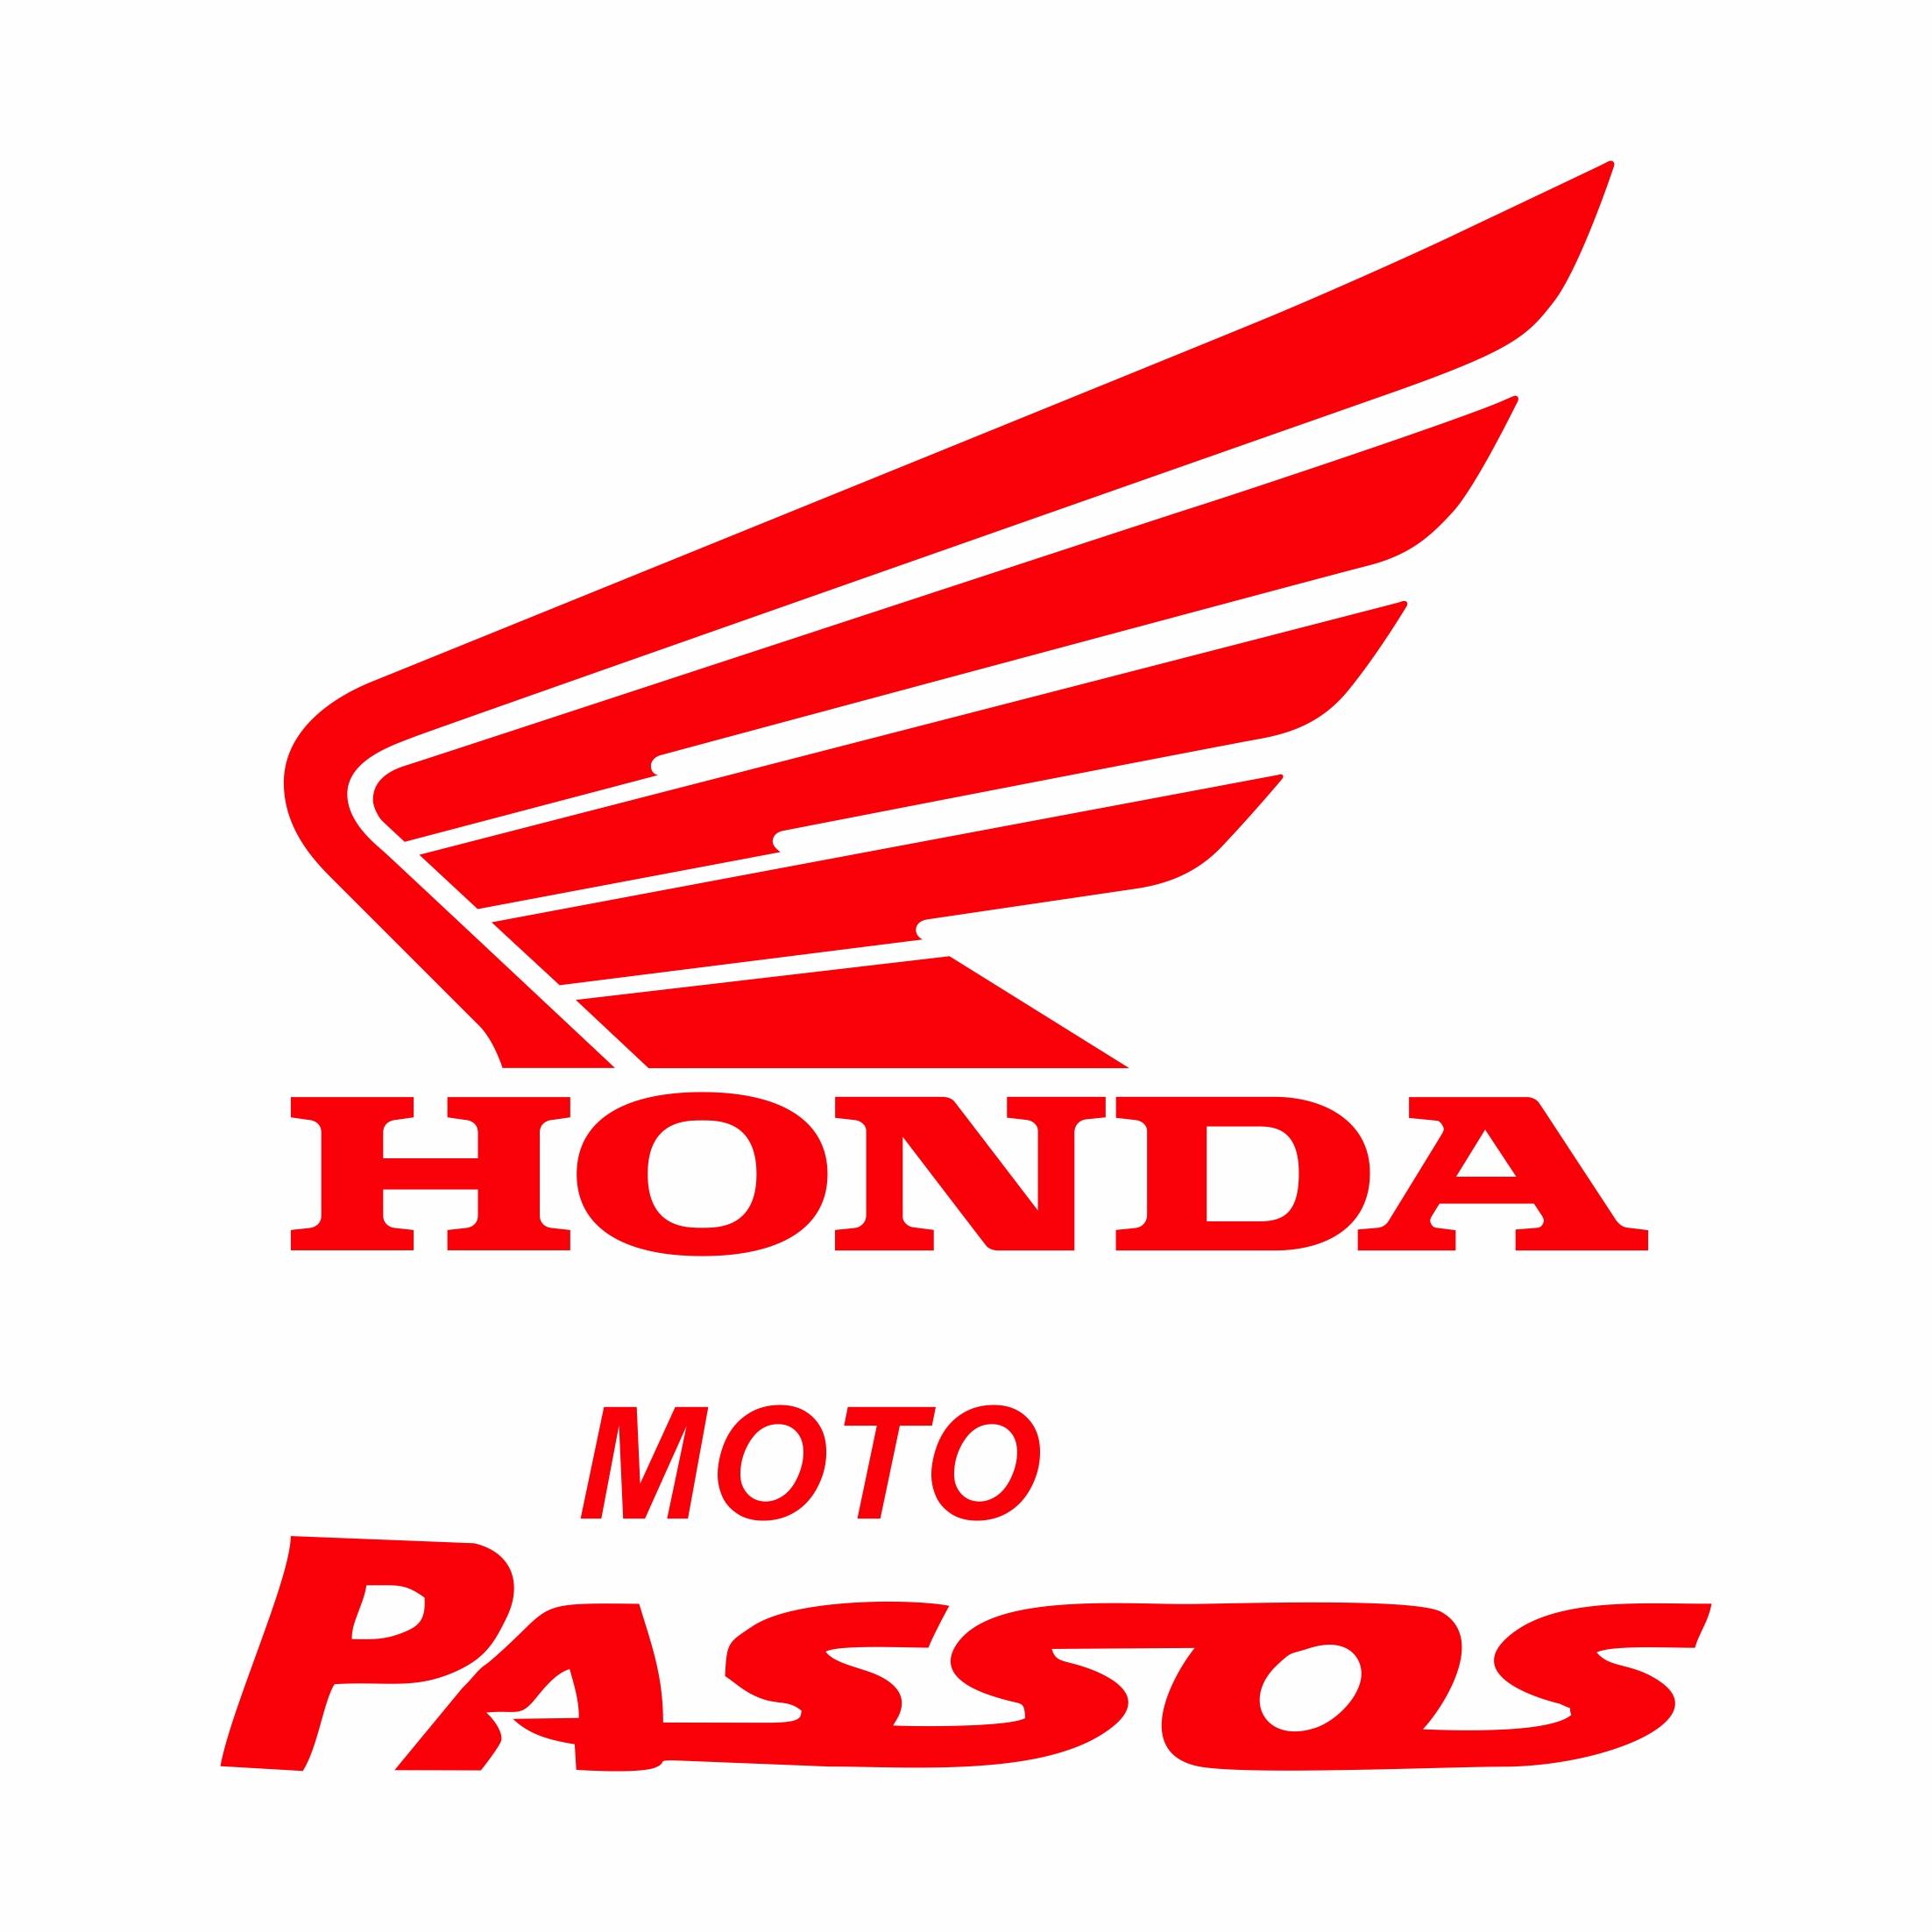 Honda Passos